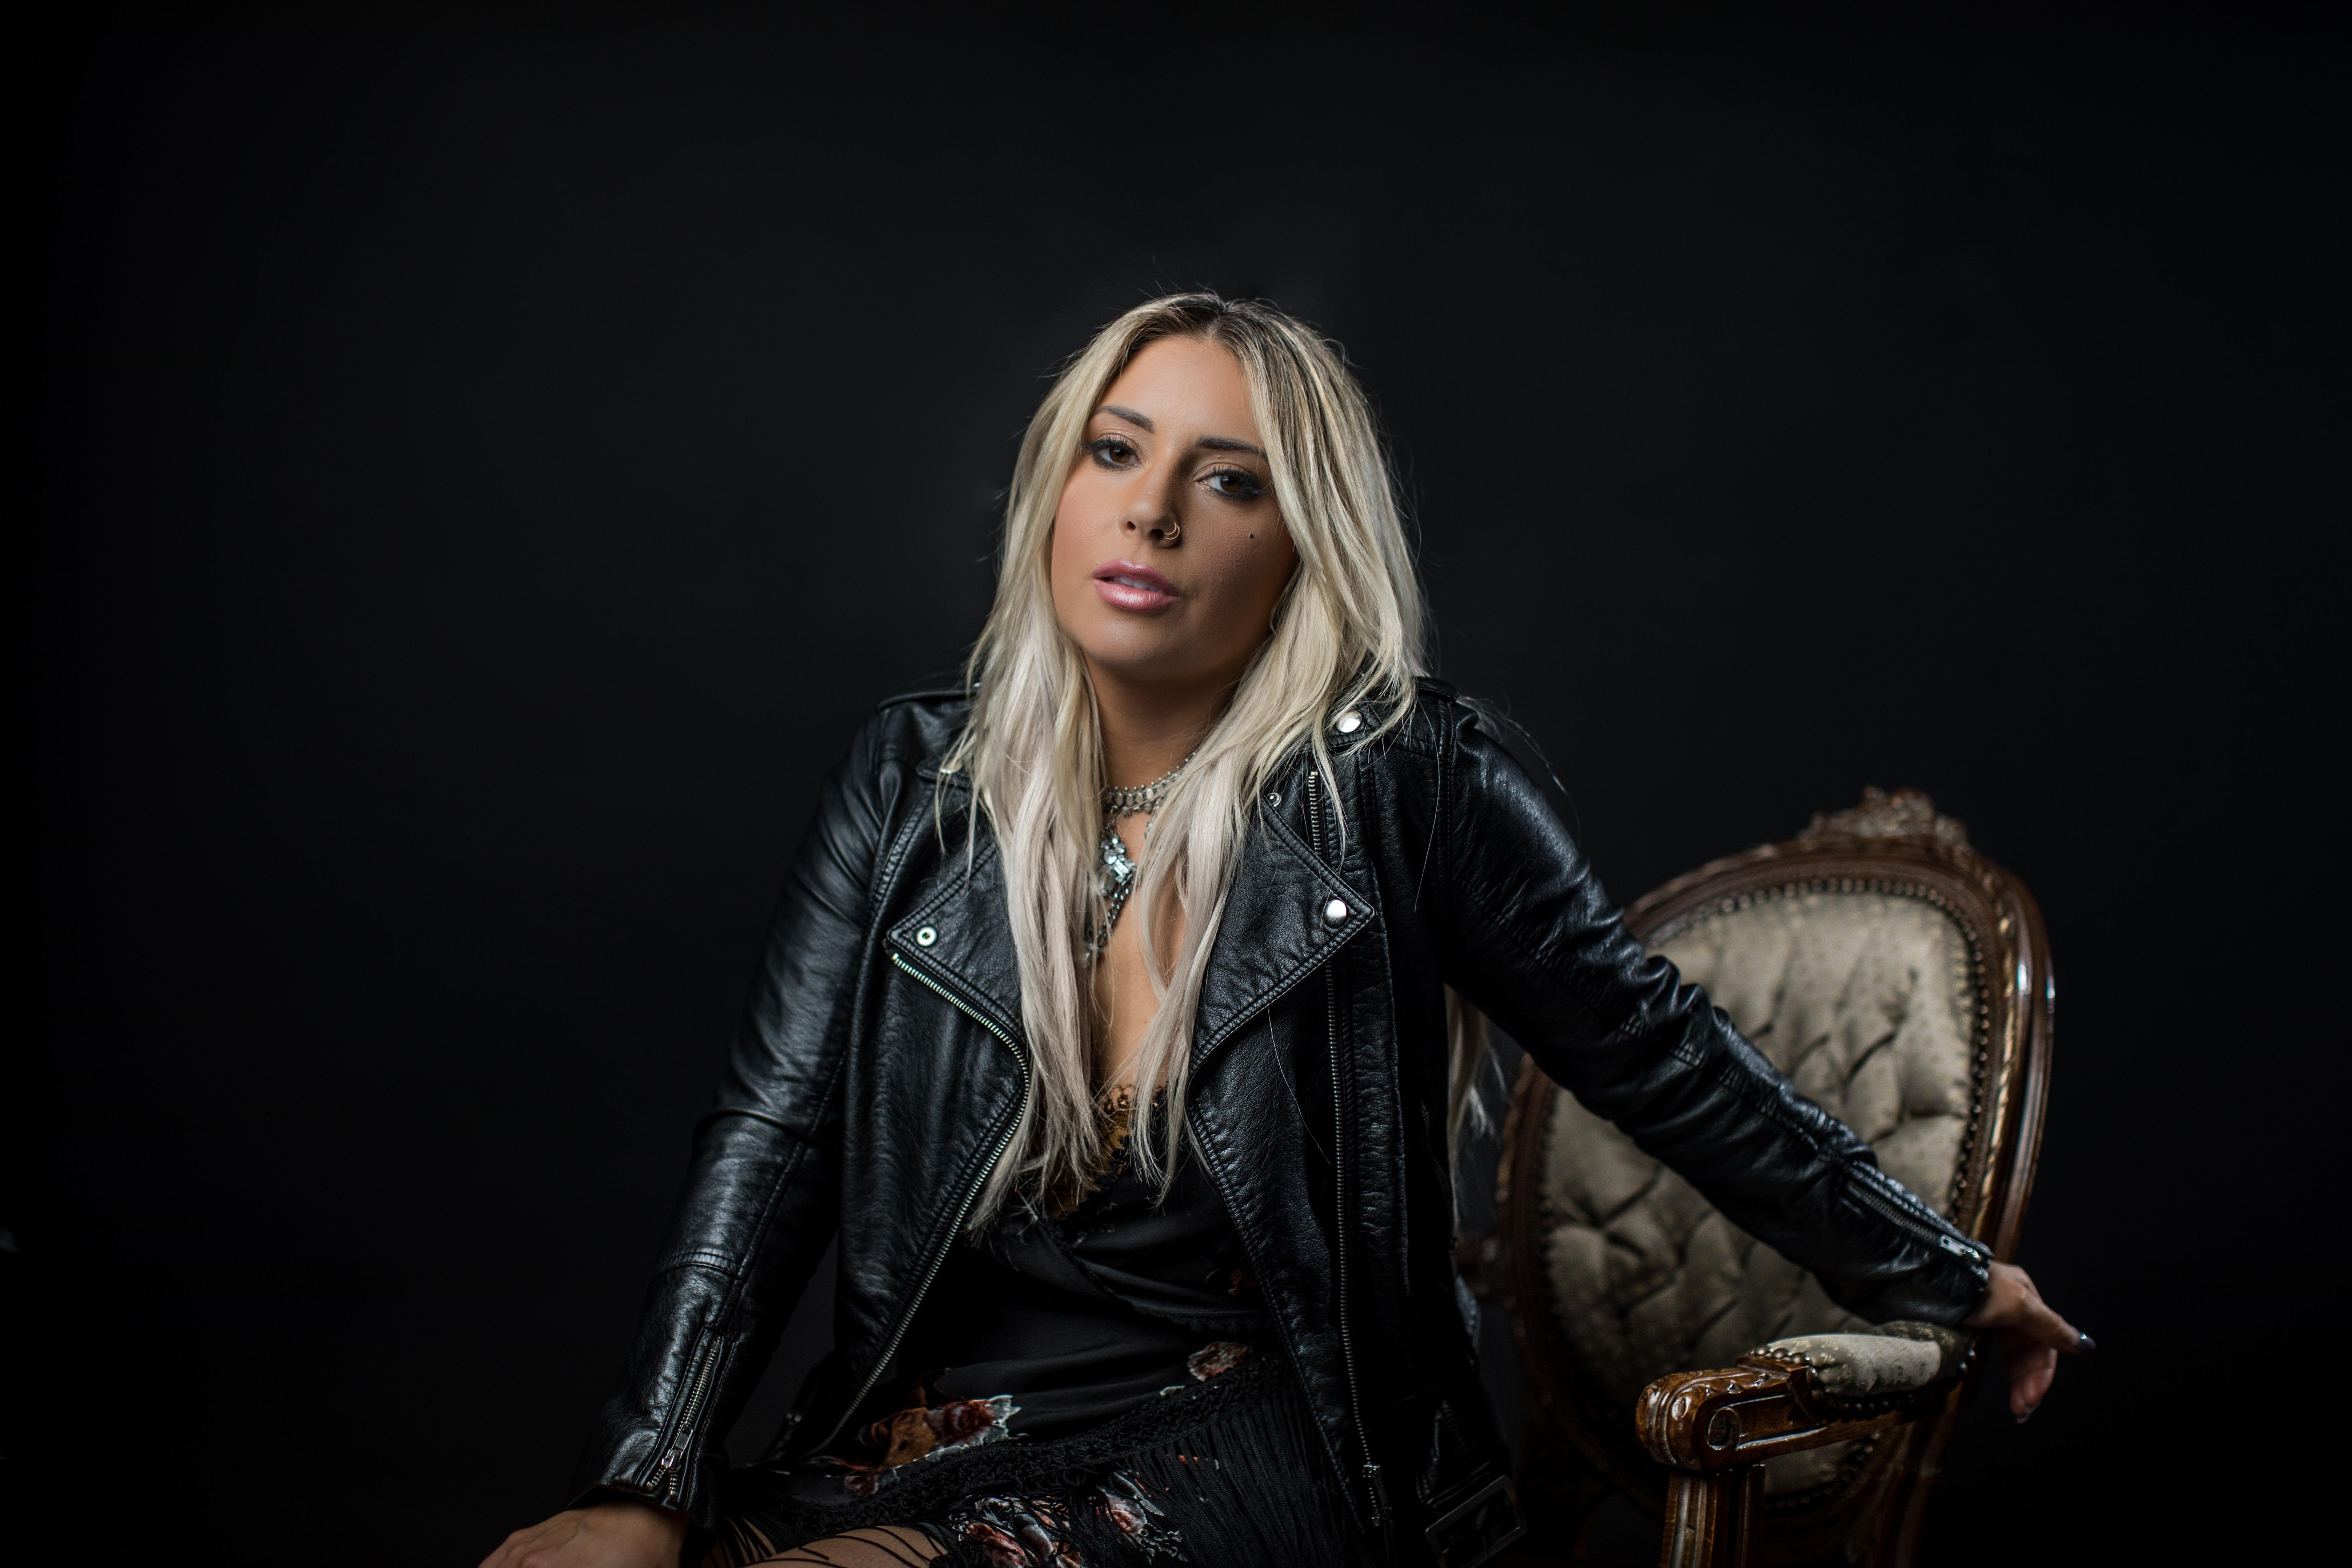 unknown celebrity wearing black motorcycle jacket